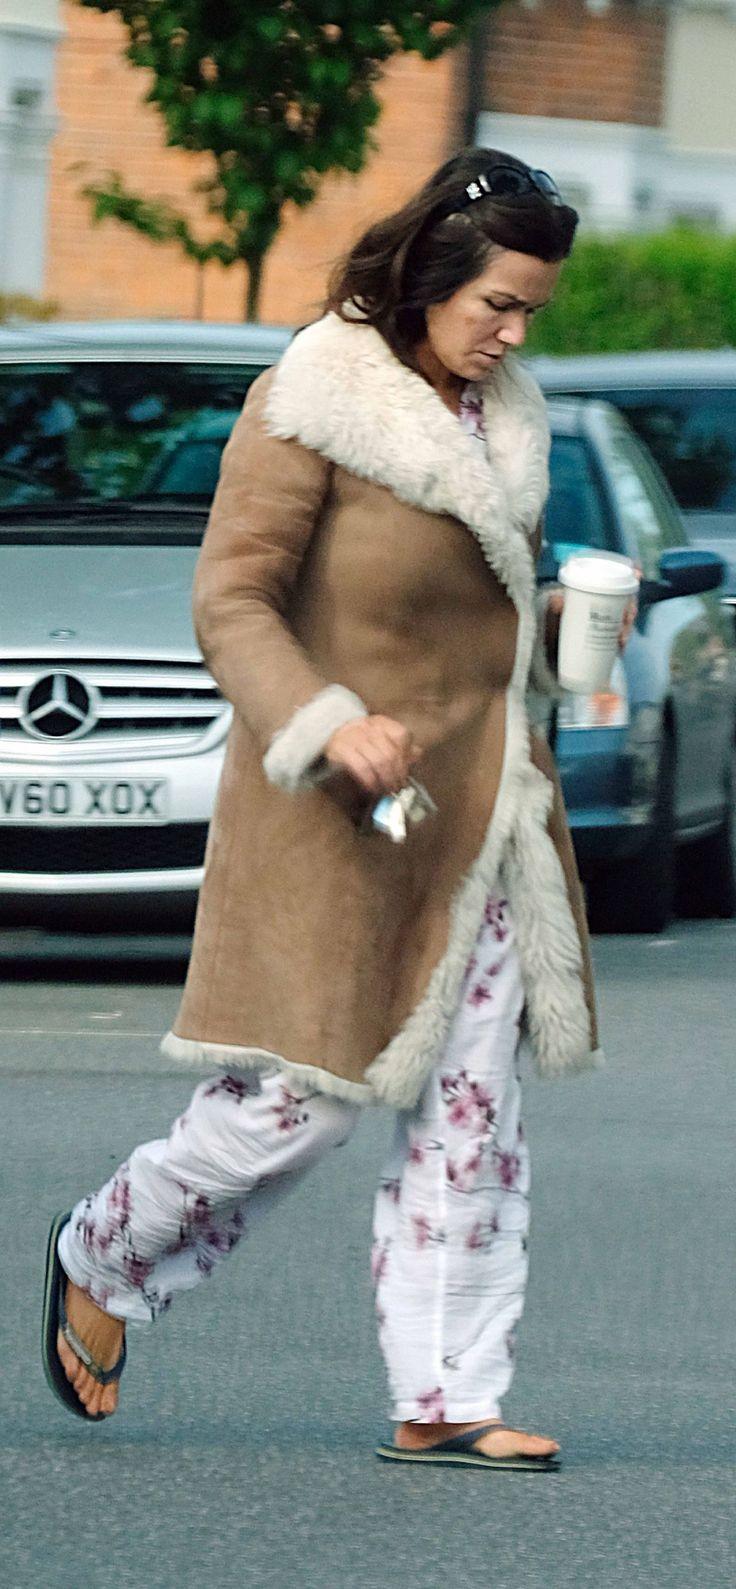 #London Susanna Reid - in Her Pyjamas Out in London 05/07/2017   Celebrity Uncensored! Read more: http://celxxx.com/2017/05/susanna-reid-in-her-pyjamas-out-in-london-05072017/